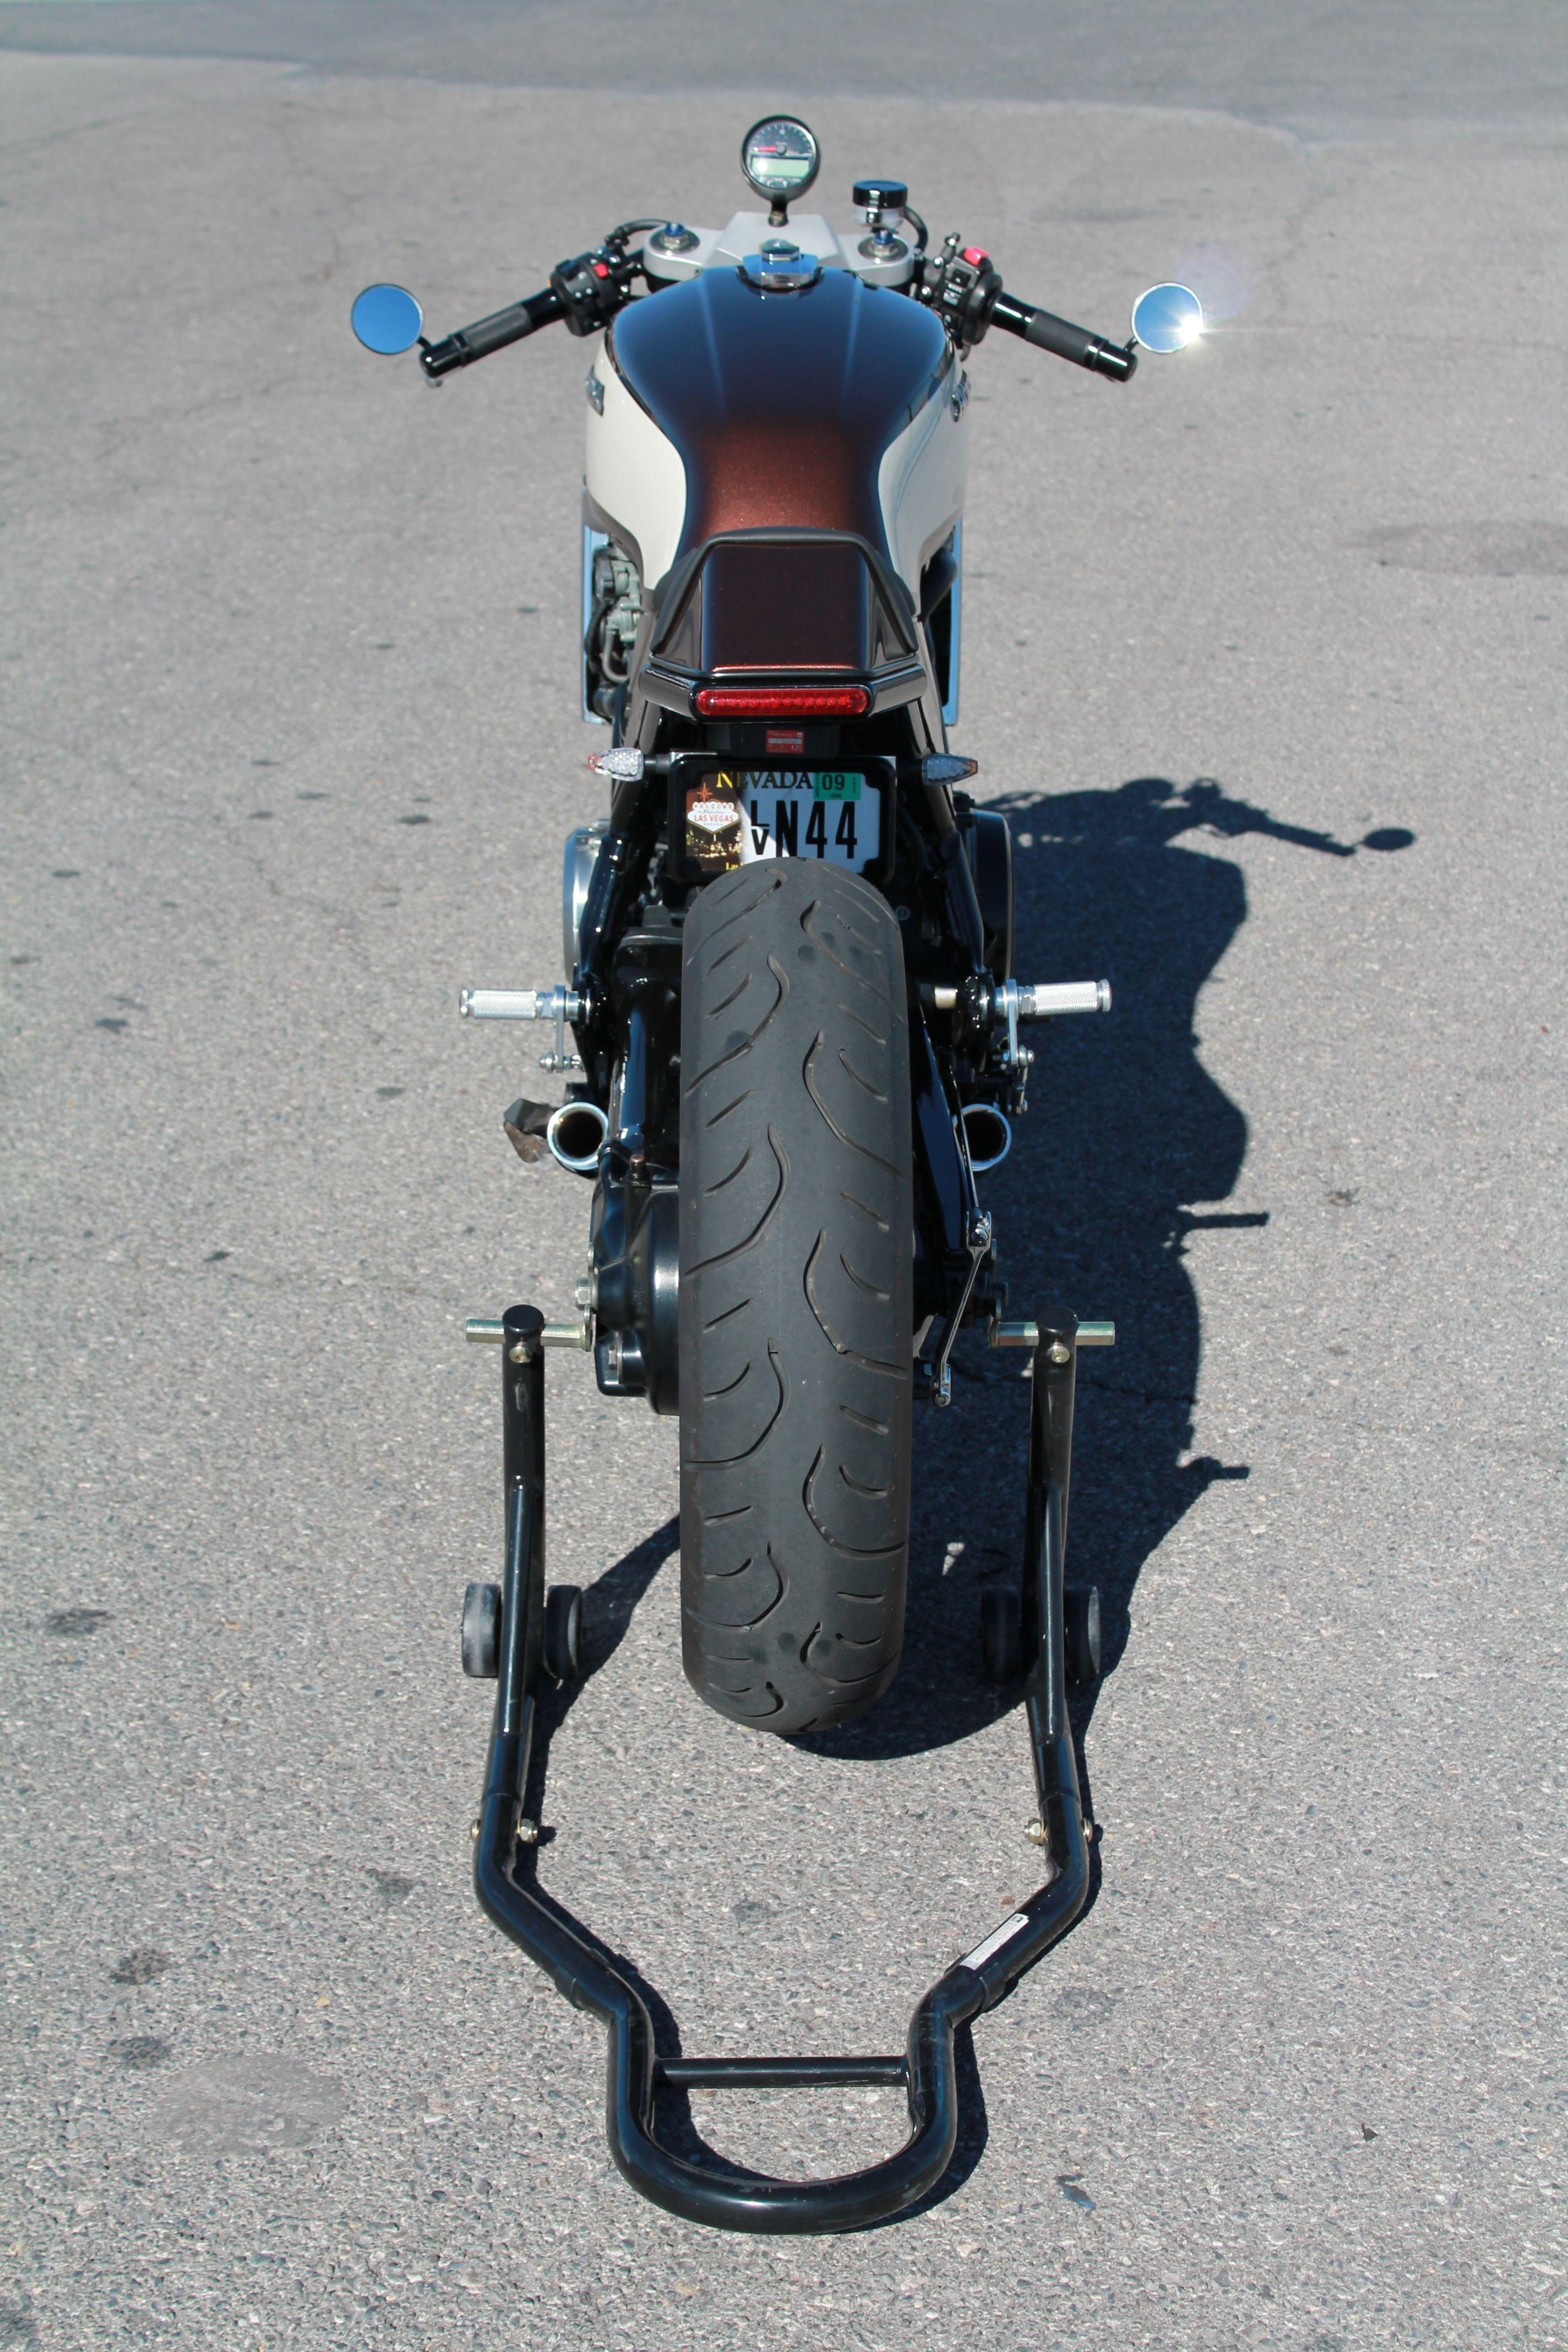 1976 Honda CB550 Cafe Racer brat CB 550 UPGRADED electronic ignition